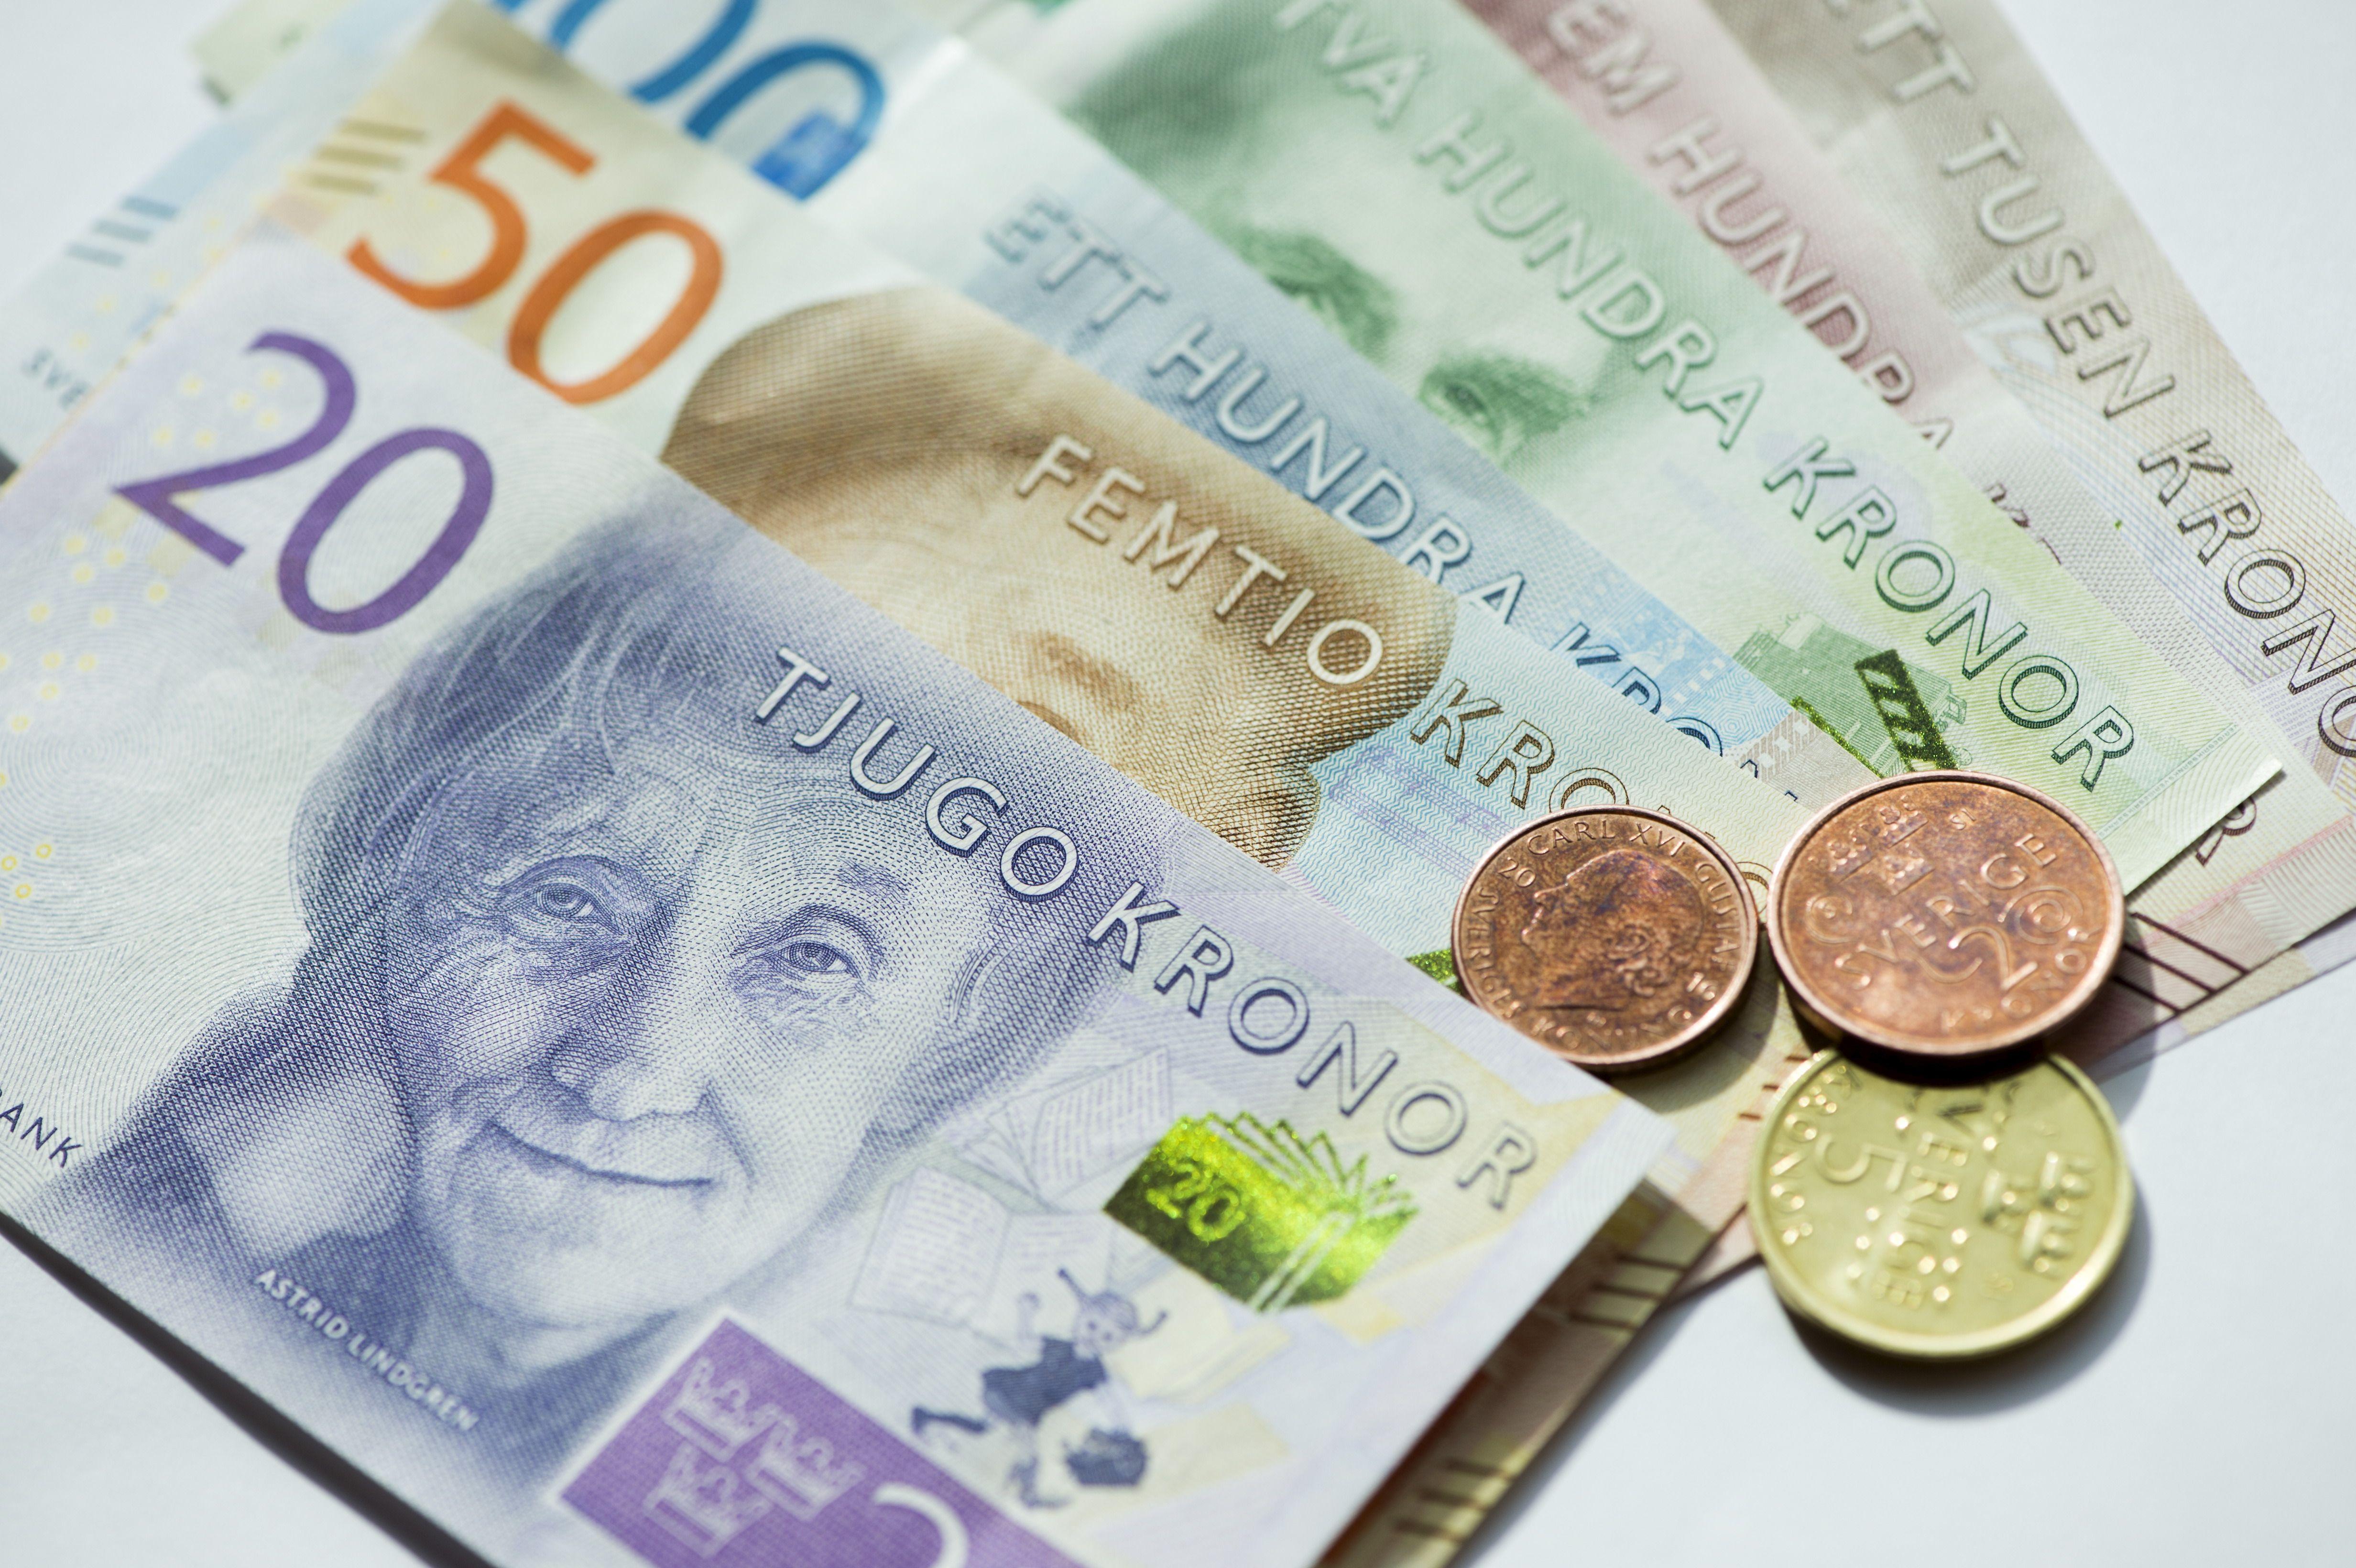 Riksbankas didina temp� lenktyn�se � neigiam� pal�kan� gelmes